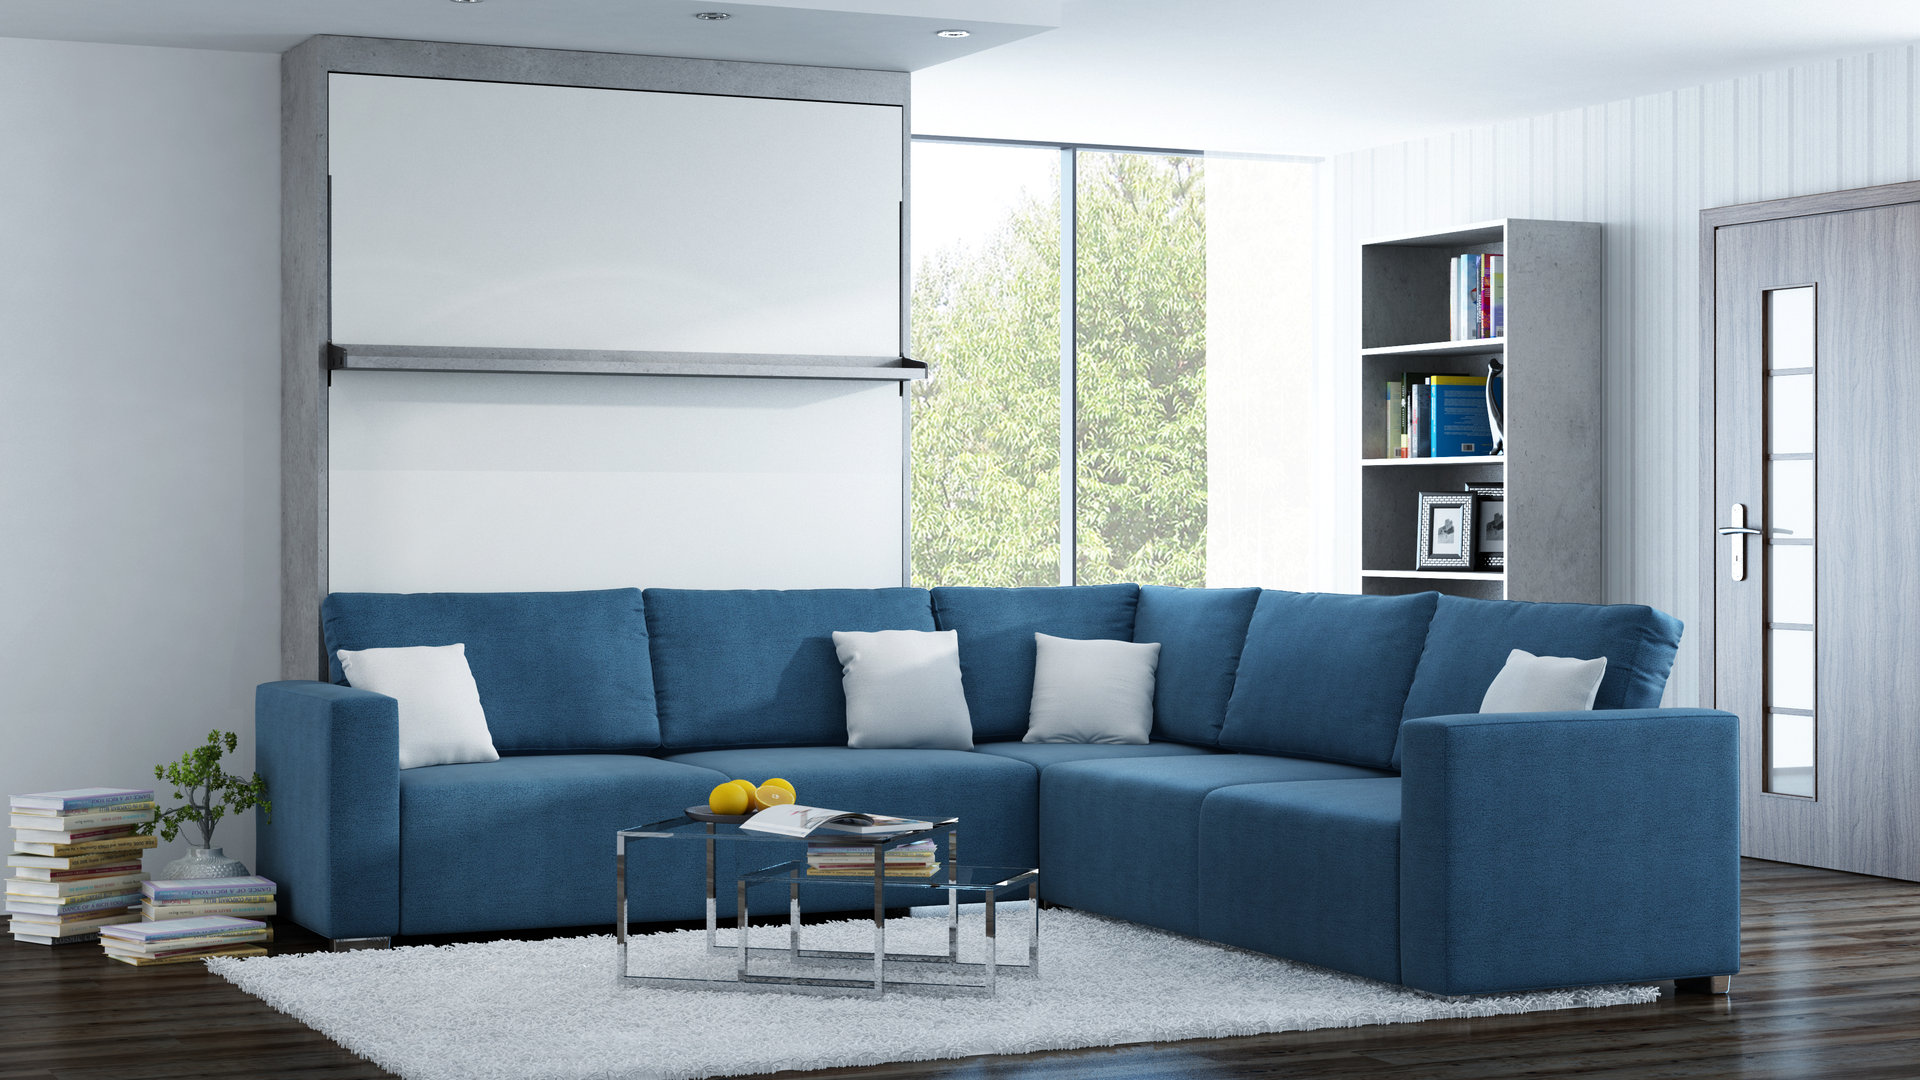 Inspirierend Sofa Ecke Beste Wahl Wandbett Mit Leggio Linea Std-std 140 X